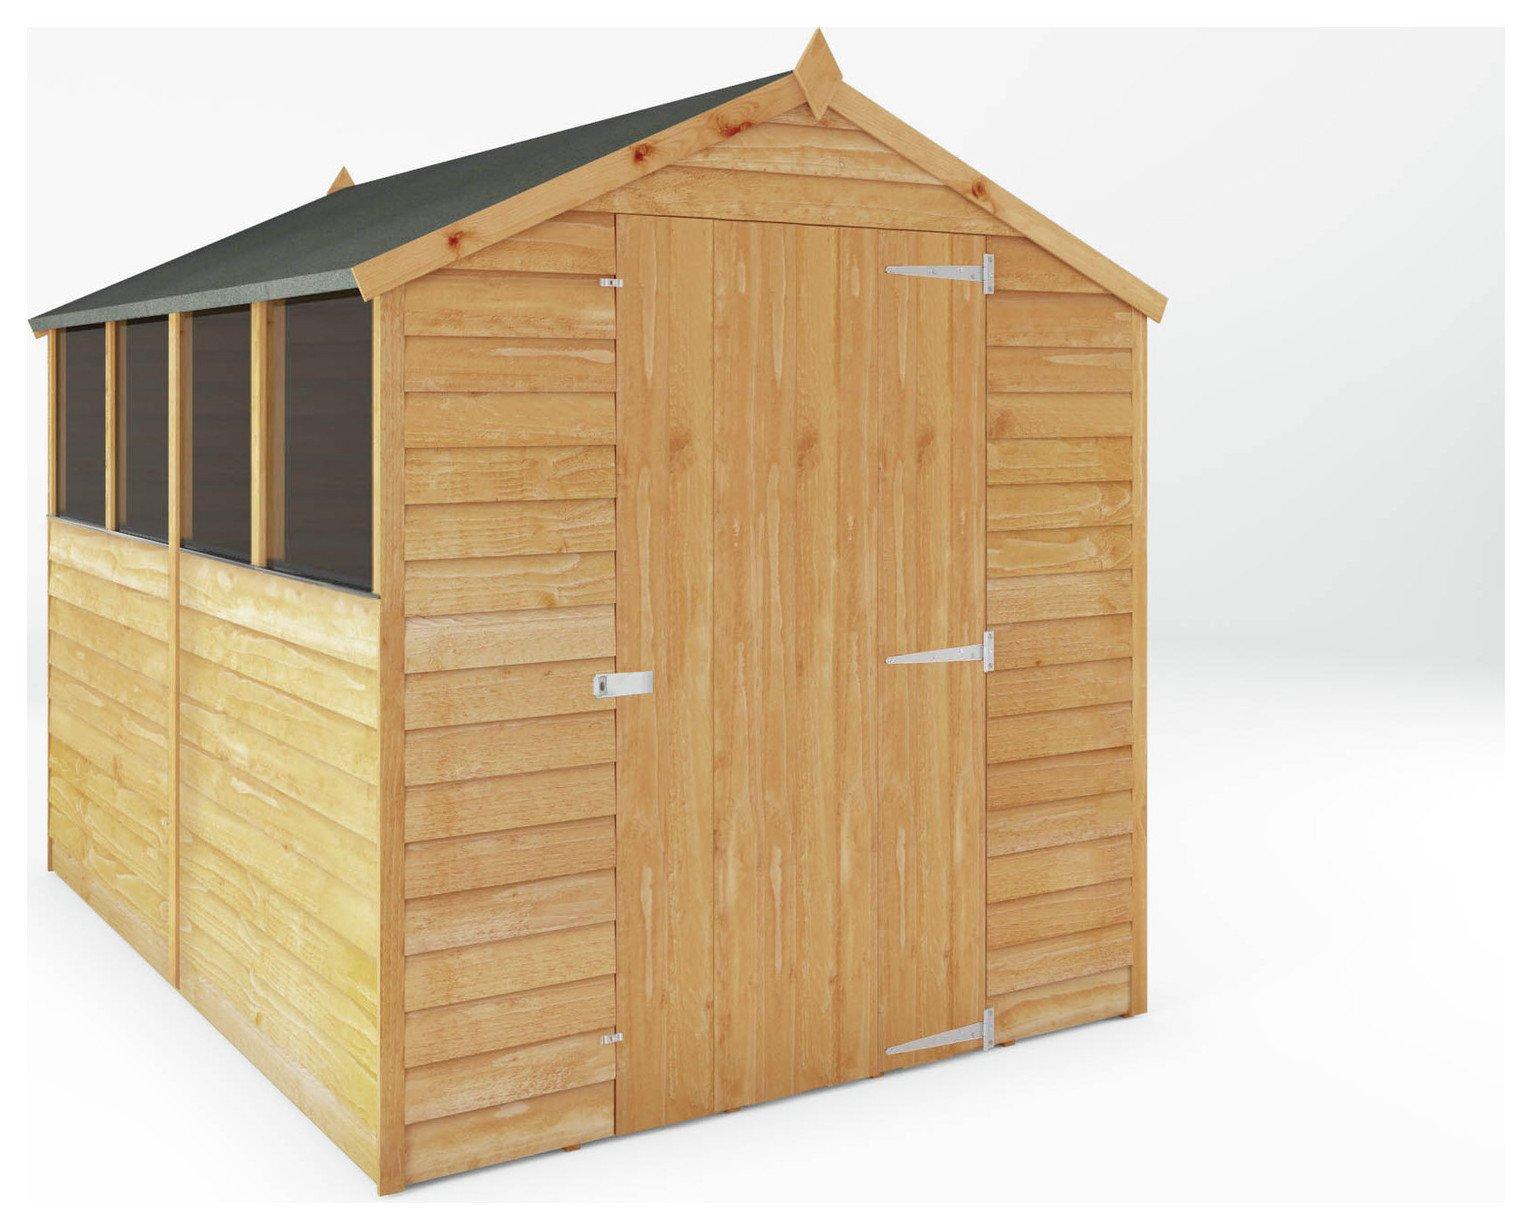 Garden Sheds Argos buy mercia overlap wooden garden shed - 8 x 6ft at argos.co.uk